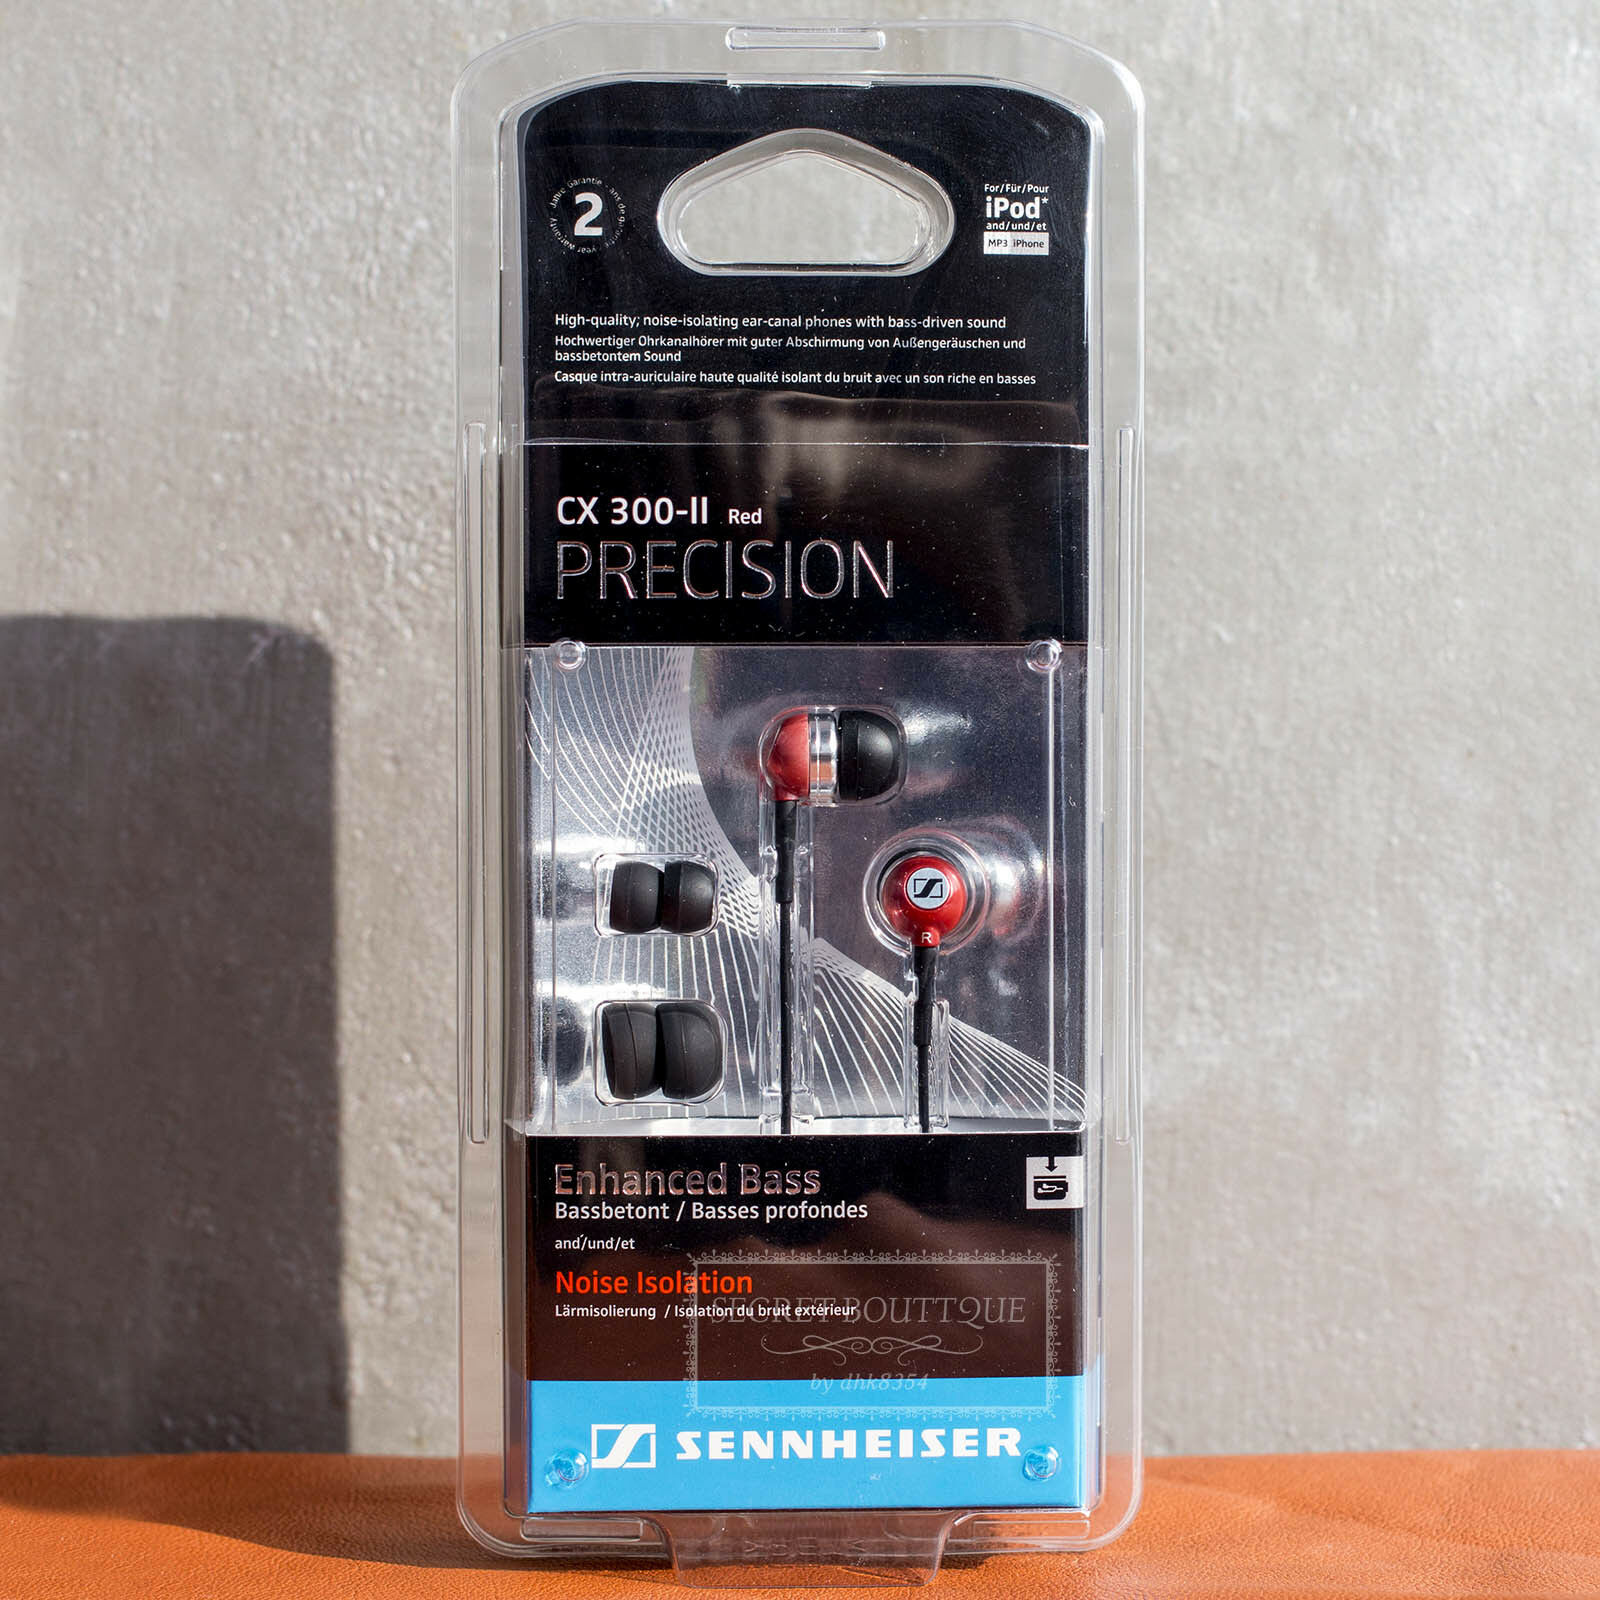 Ean 4044155043020 Sennheiser Cx 300 Ii Precision In Ear Only Earphone Sport Product Image For Headphones